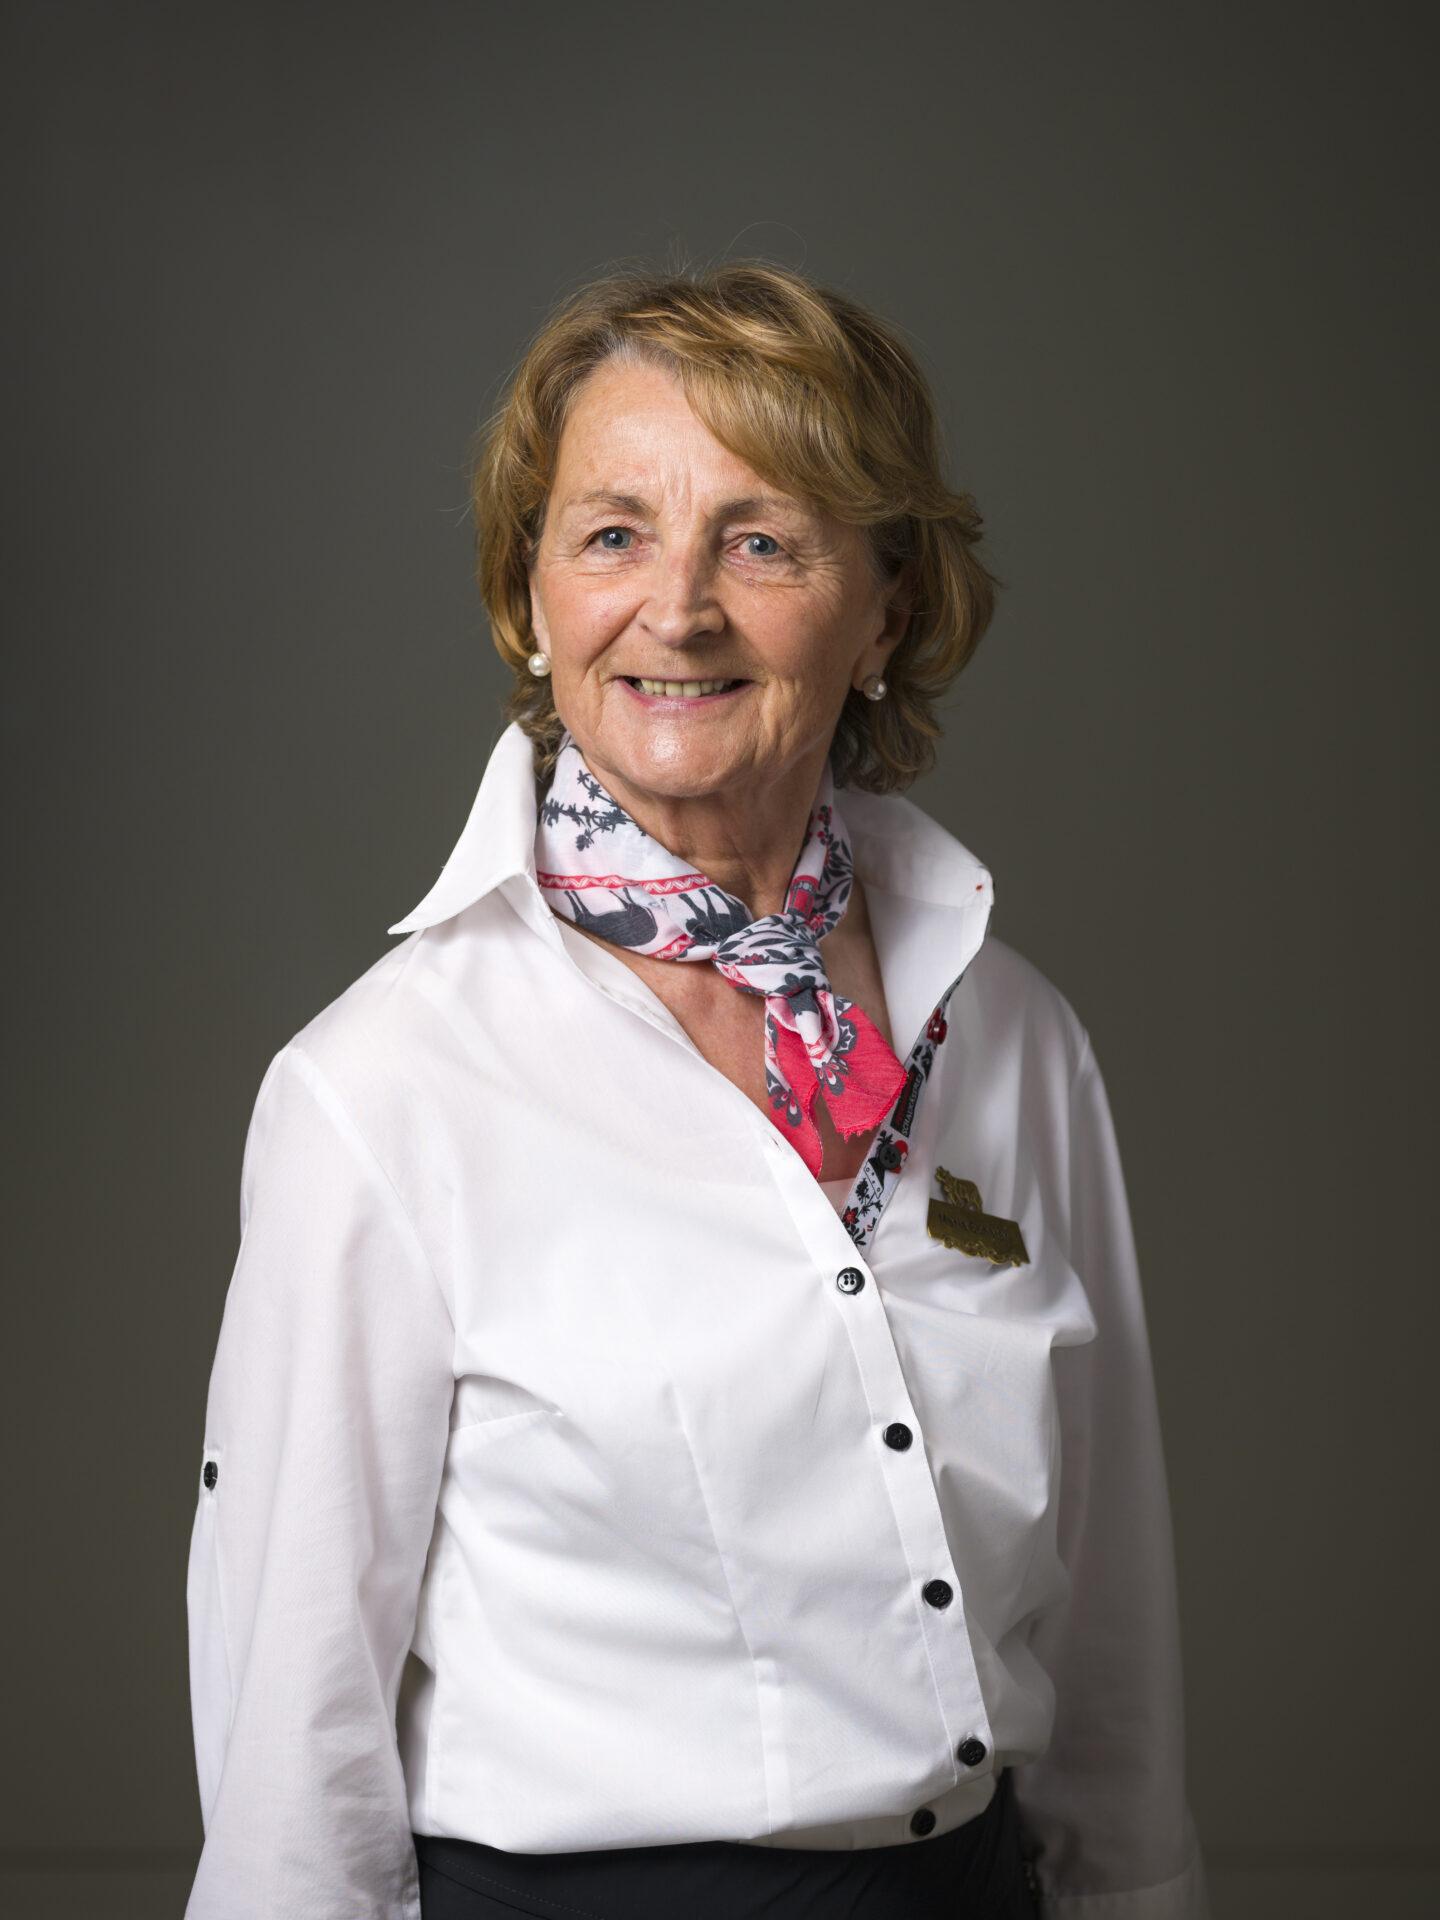 Maria Ebneter, Gastgeberin